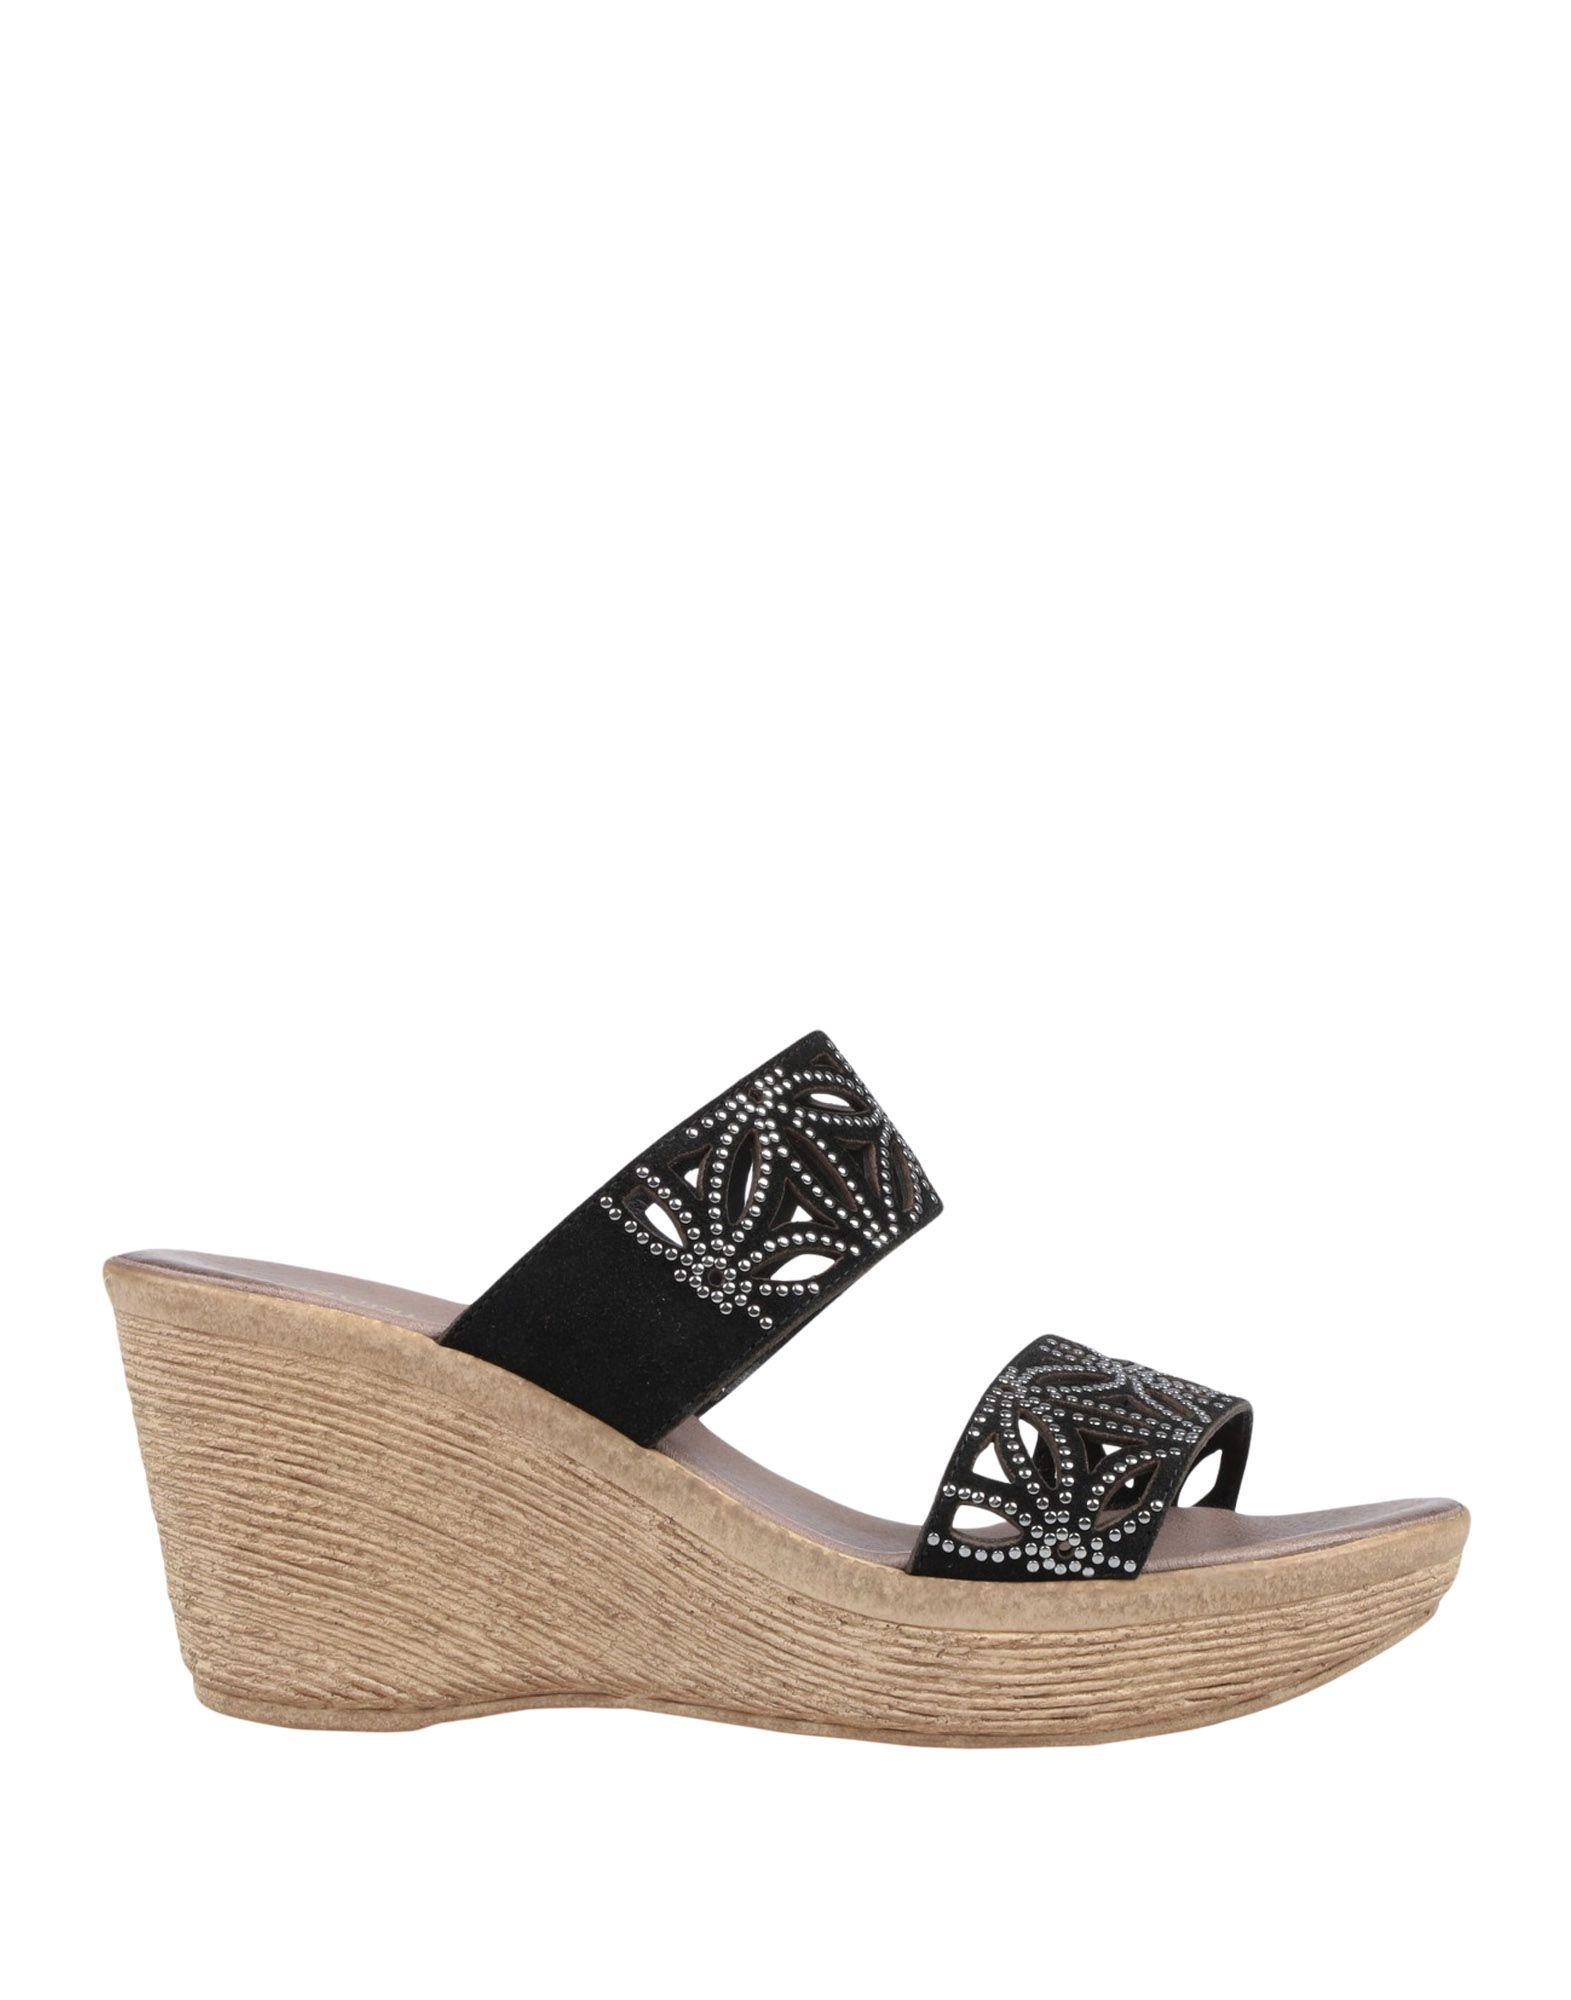 Grünland Sandalen Damen  11485565DW Gute Qualität beliebte Schuhe